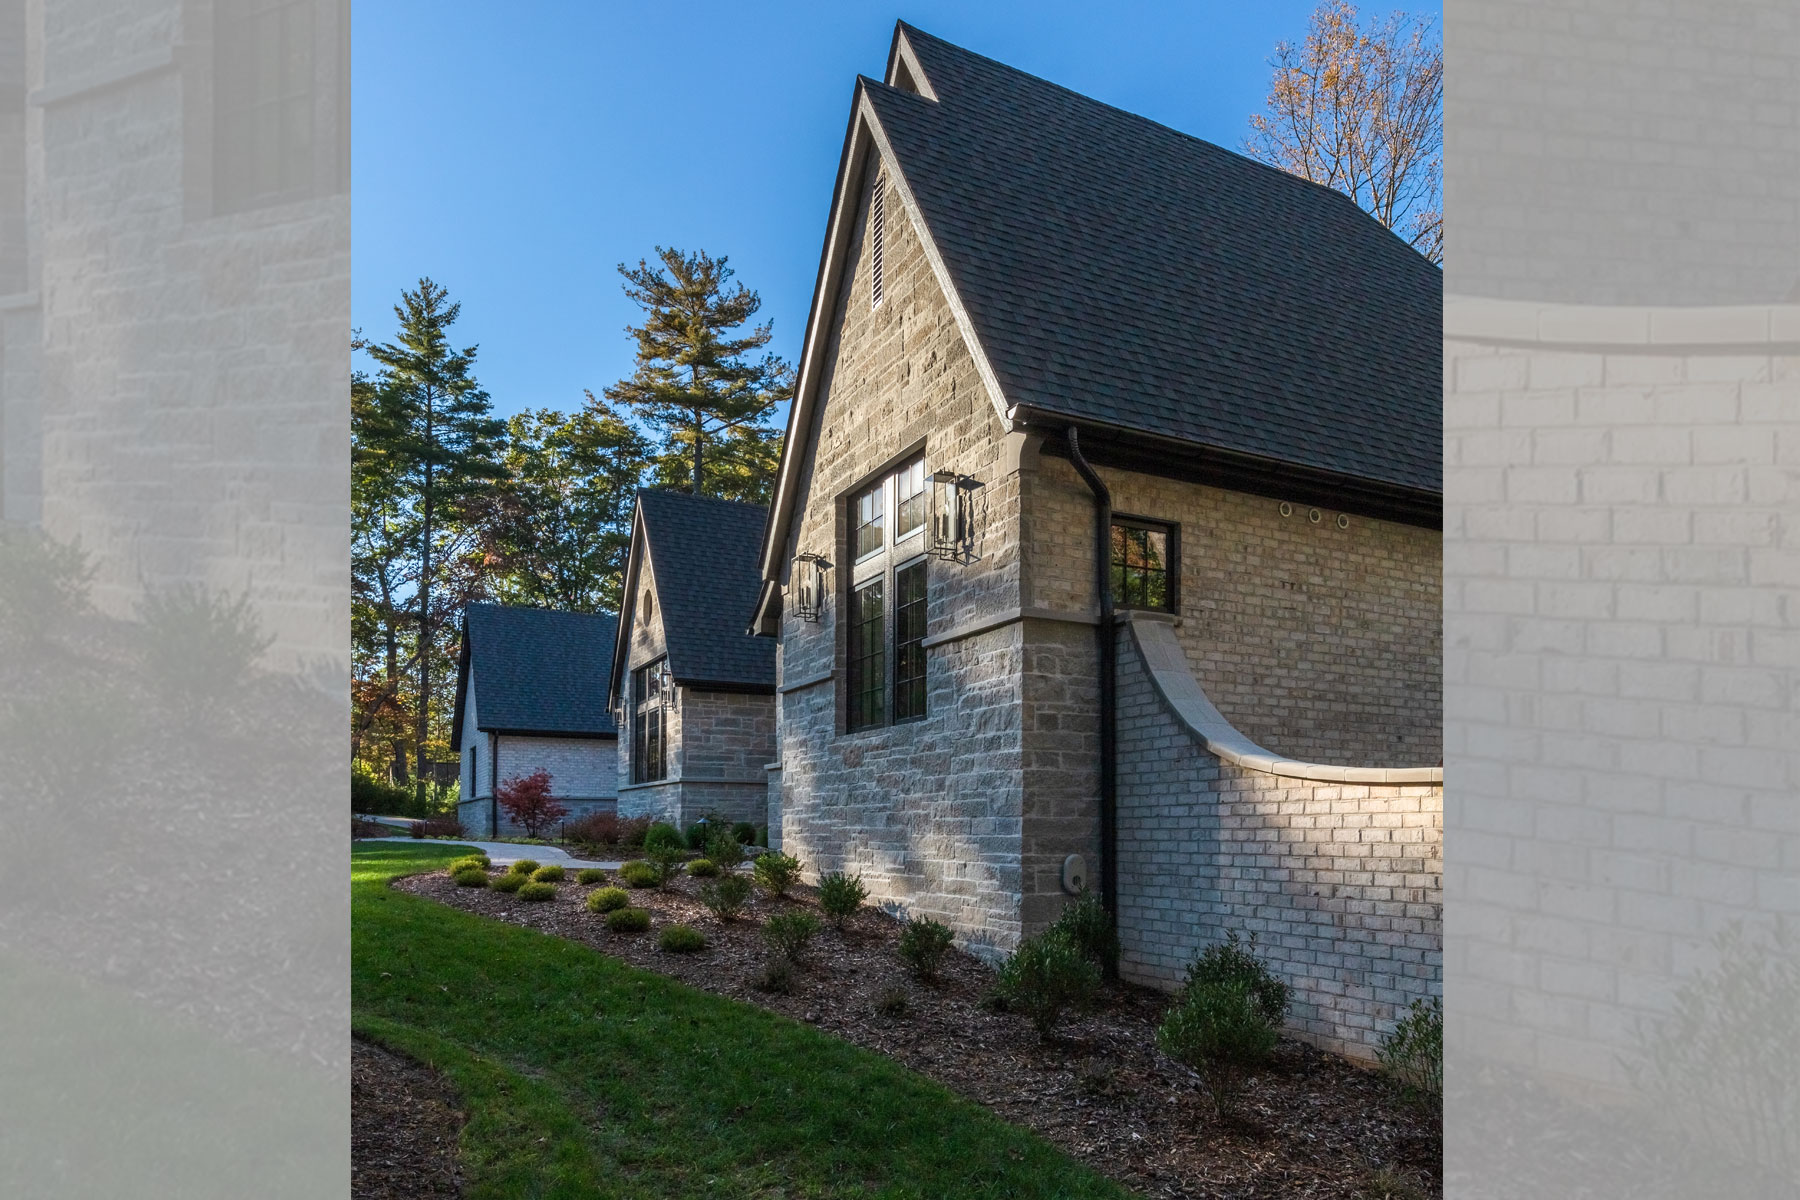 White brick and stone mountain home